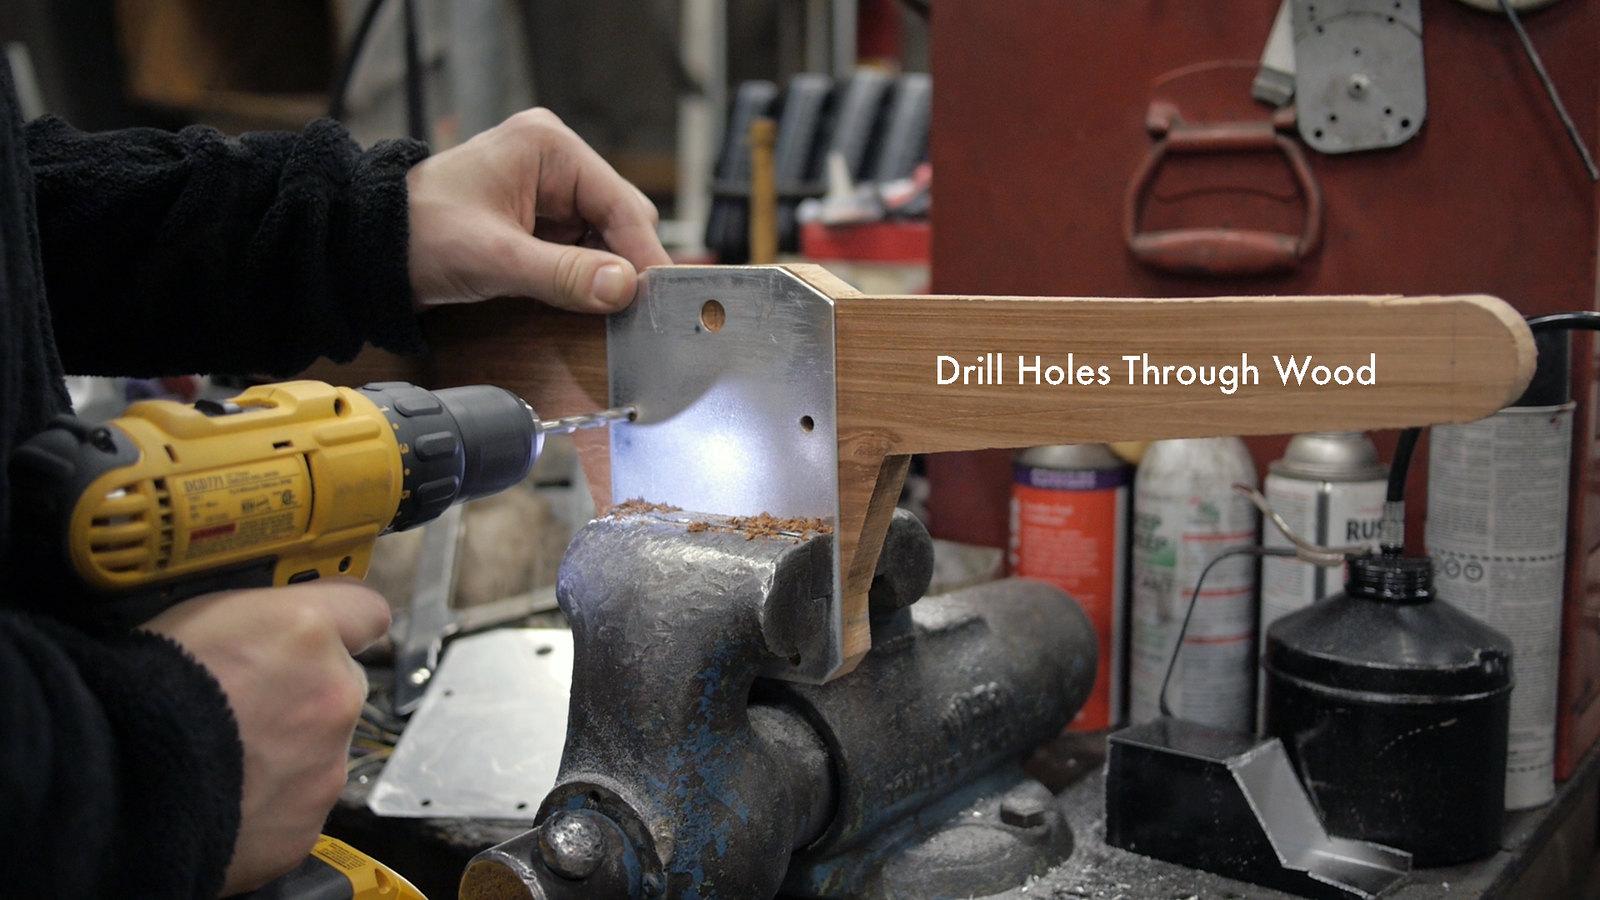 Drill Holes Through Wood